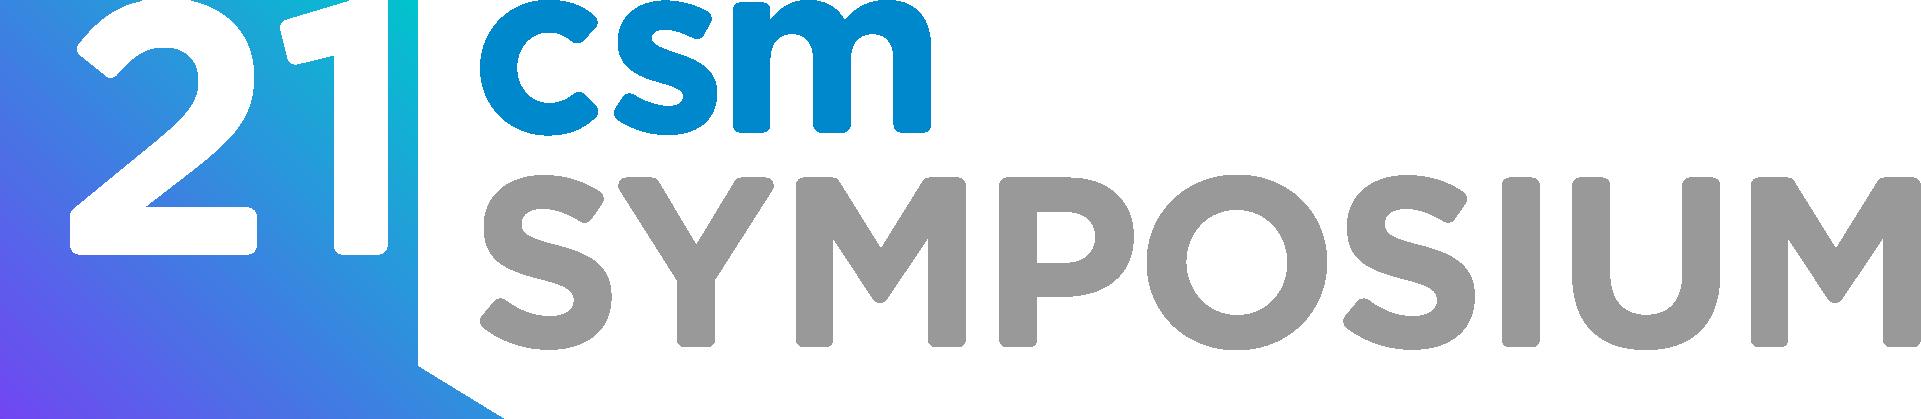 logo_digital_2021_csm-symposium_color-3